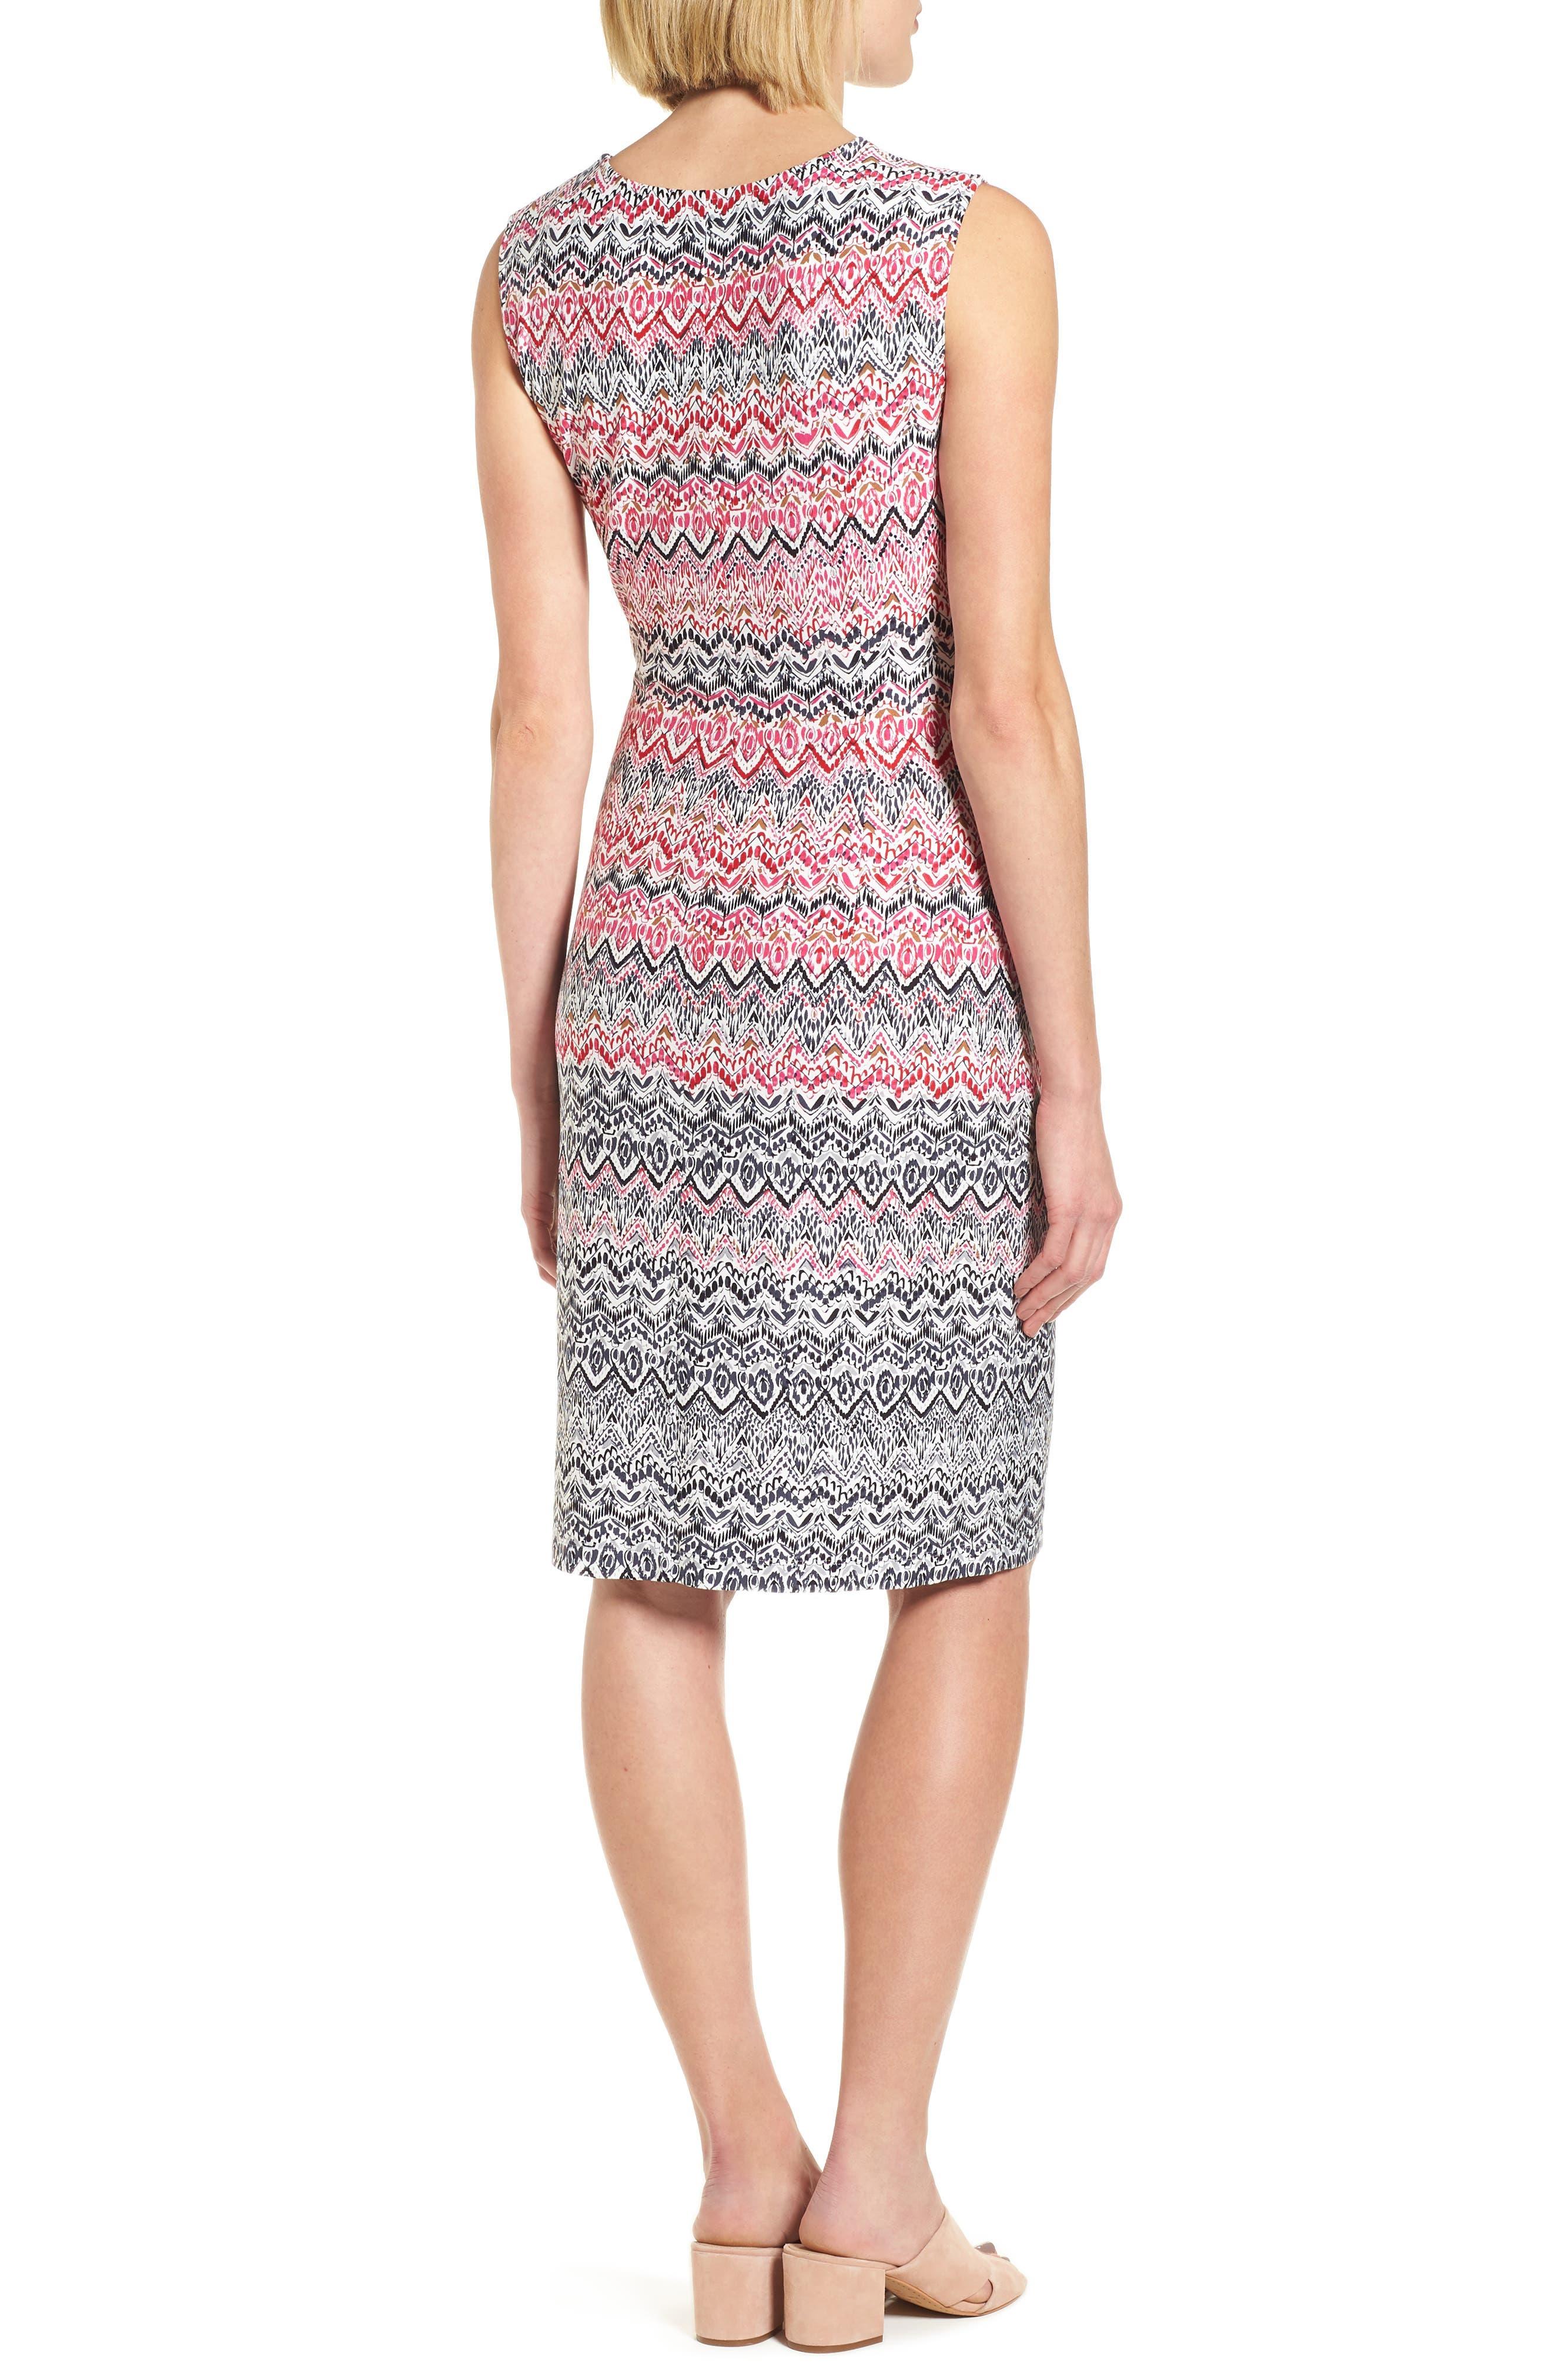 Alternate Image 2  - NIC+ZOE Spiced Up Twist Sheath Dress (Regular & Petite)